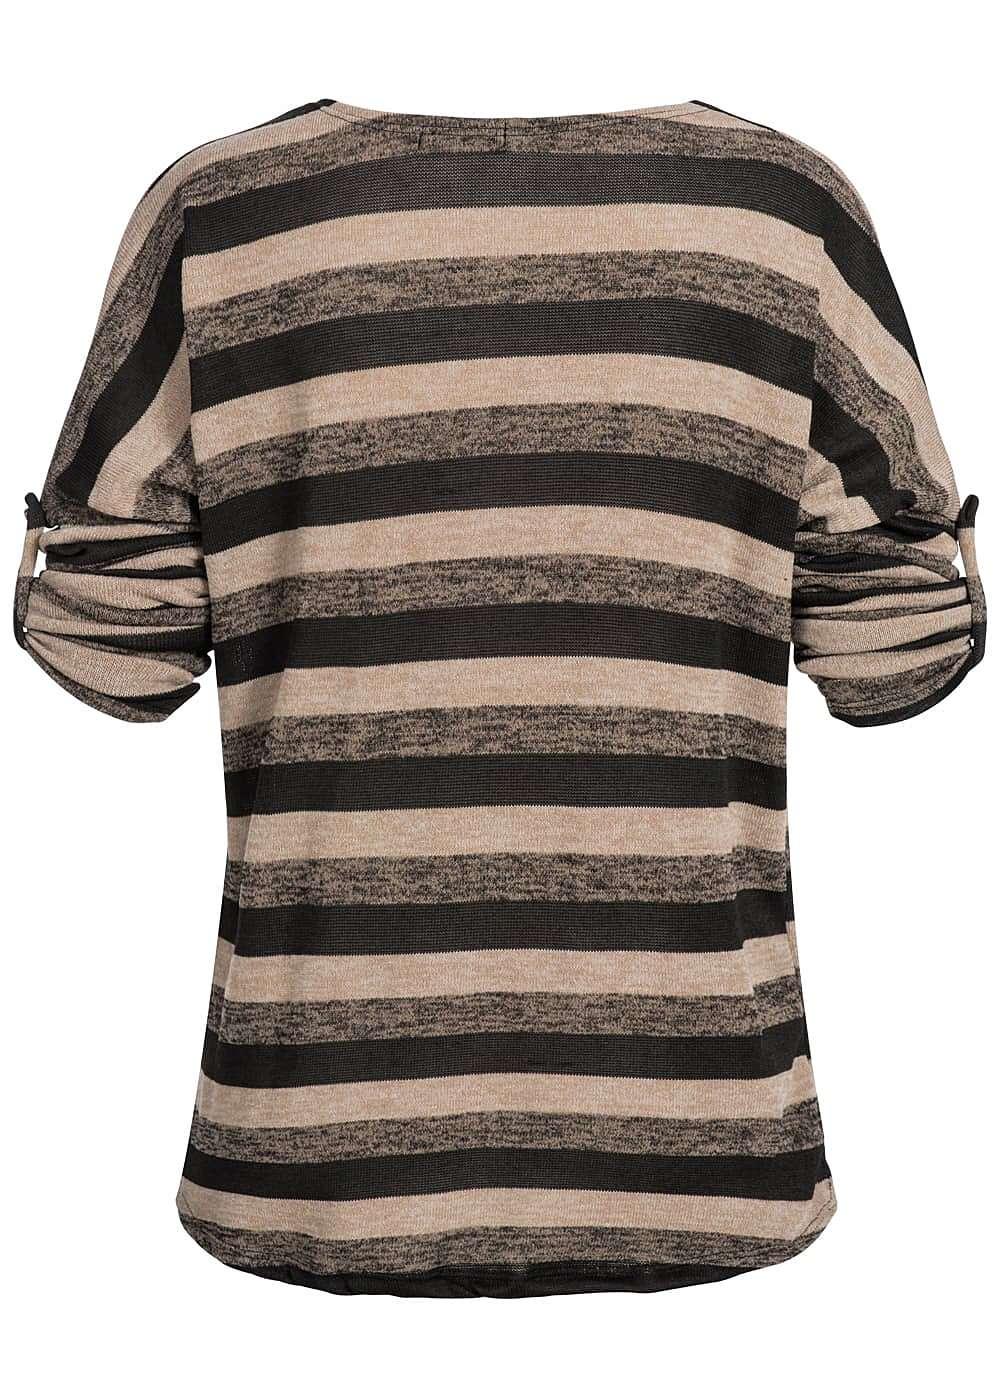 styleboom fashion damen turn up shirt gestreift hinten l nger beige. Black Bedroom Furniture Sets. Home Design Ideas